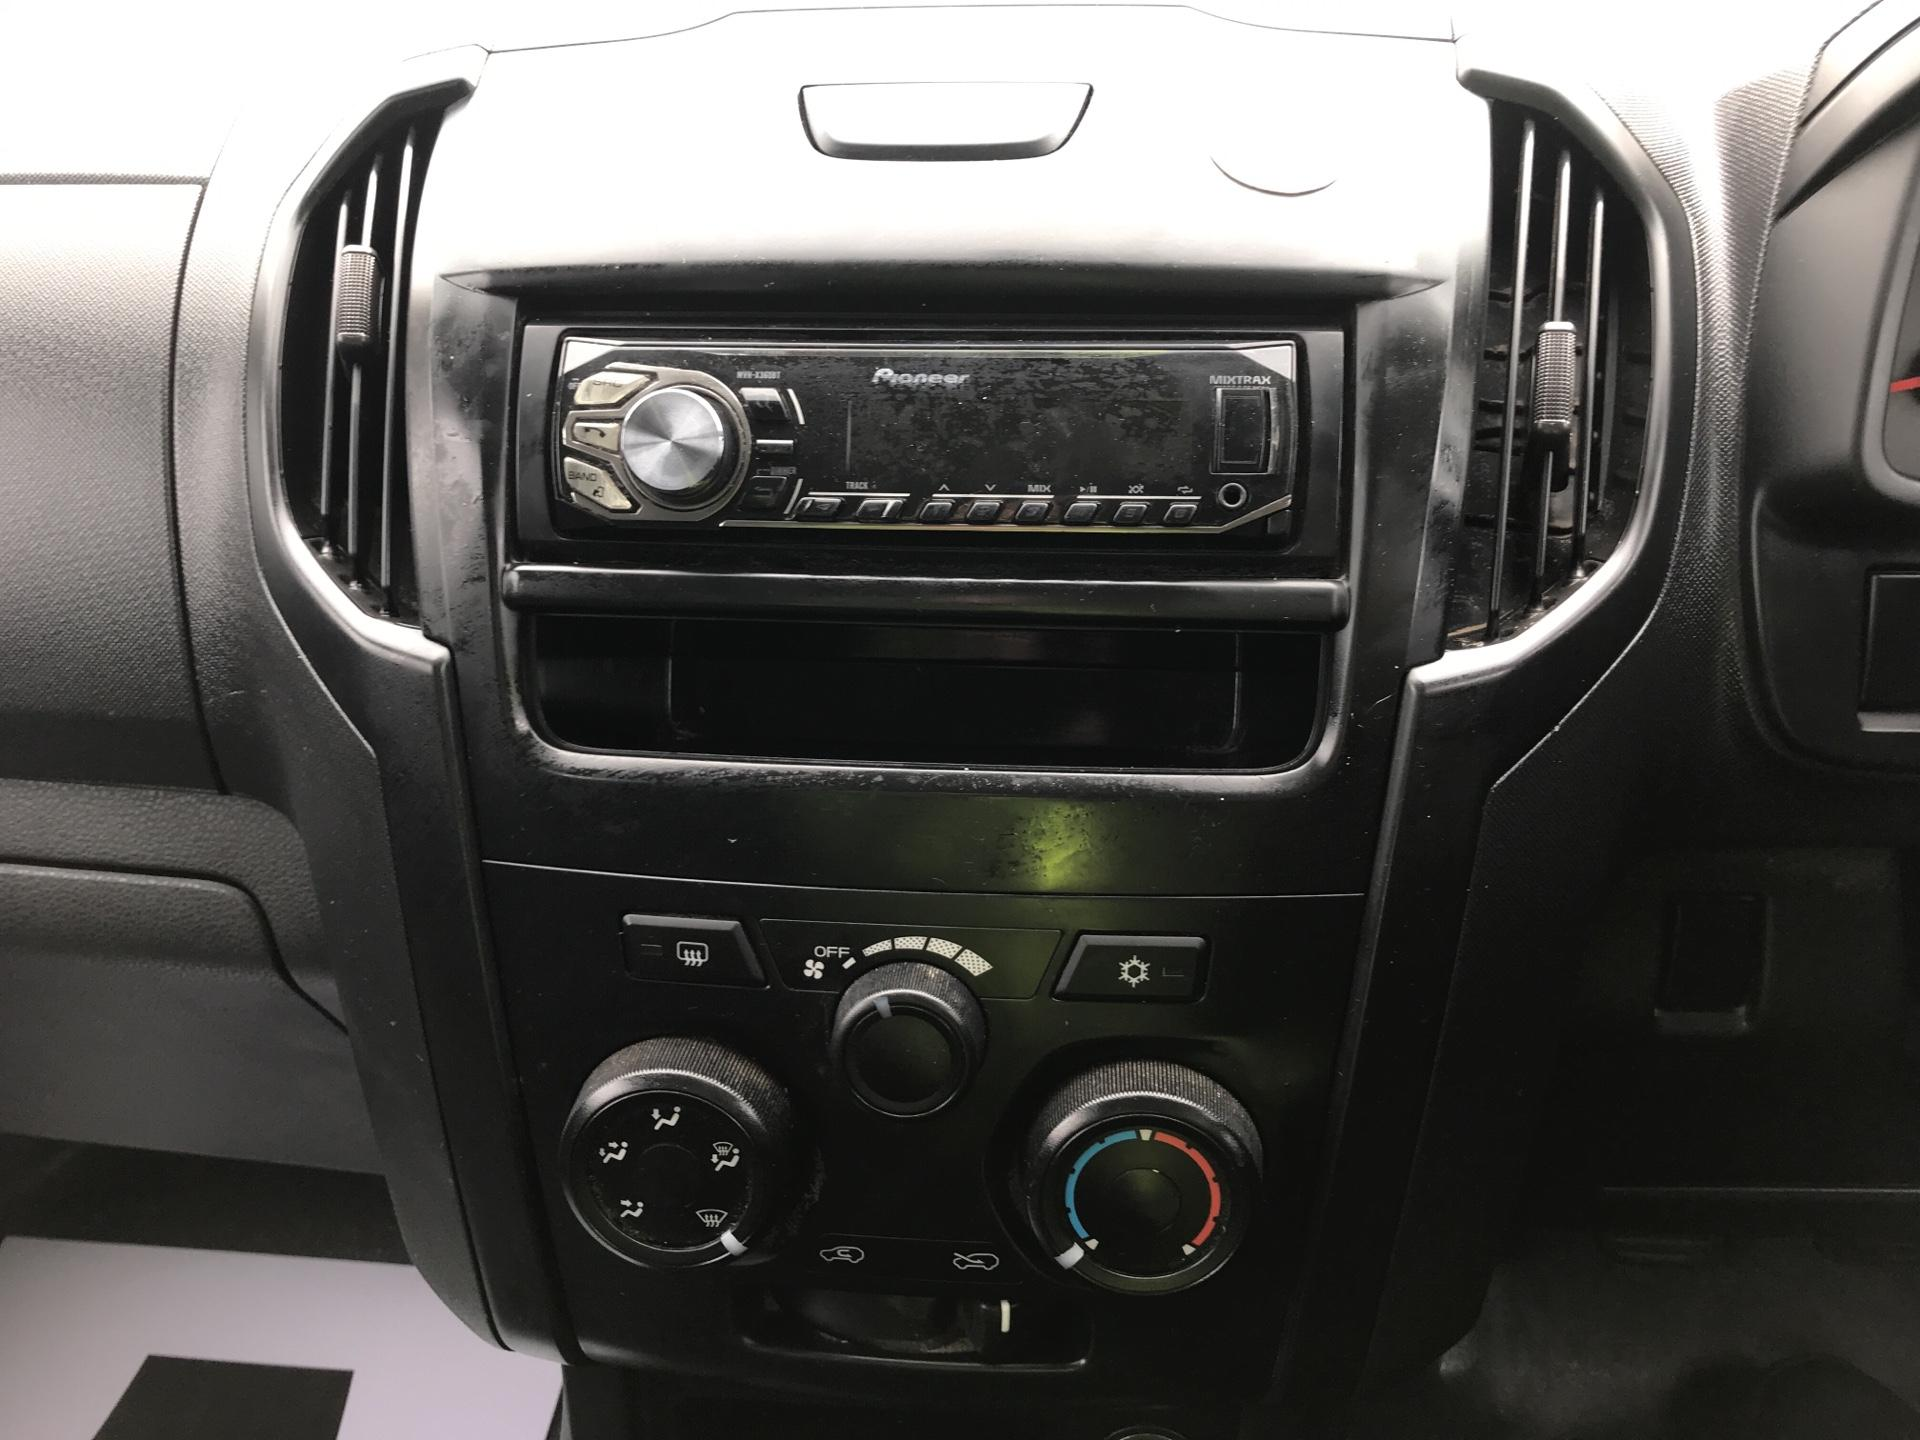 2015 Isuzu D-Max 2.5Td Double Cab 4X4 (YE65VOF) Image 10